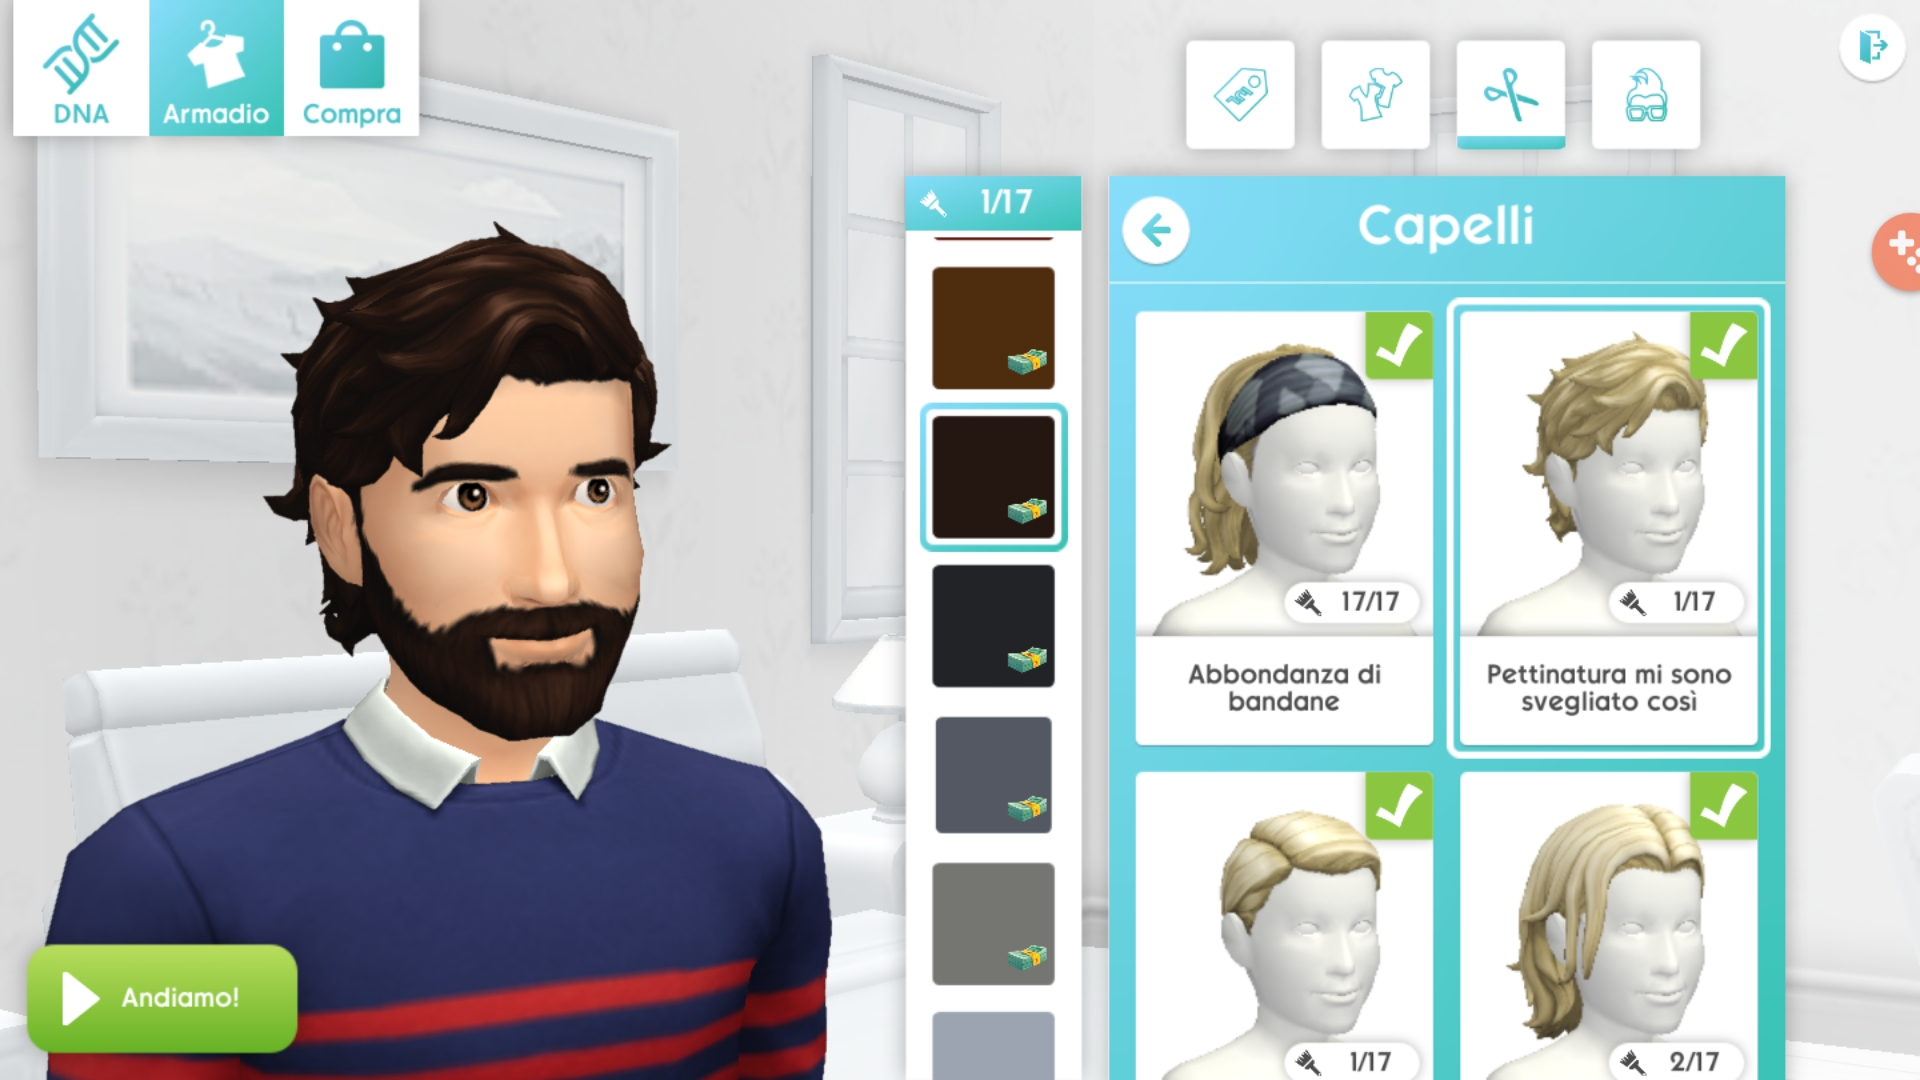 Screenshot_20201001-200239_The Sims.jpg